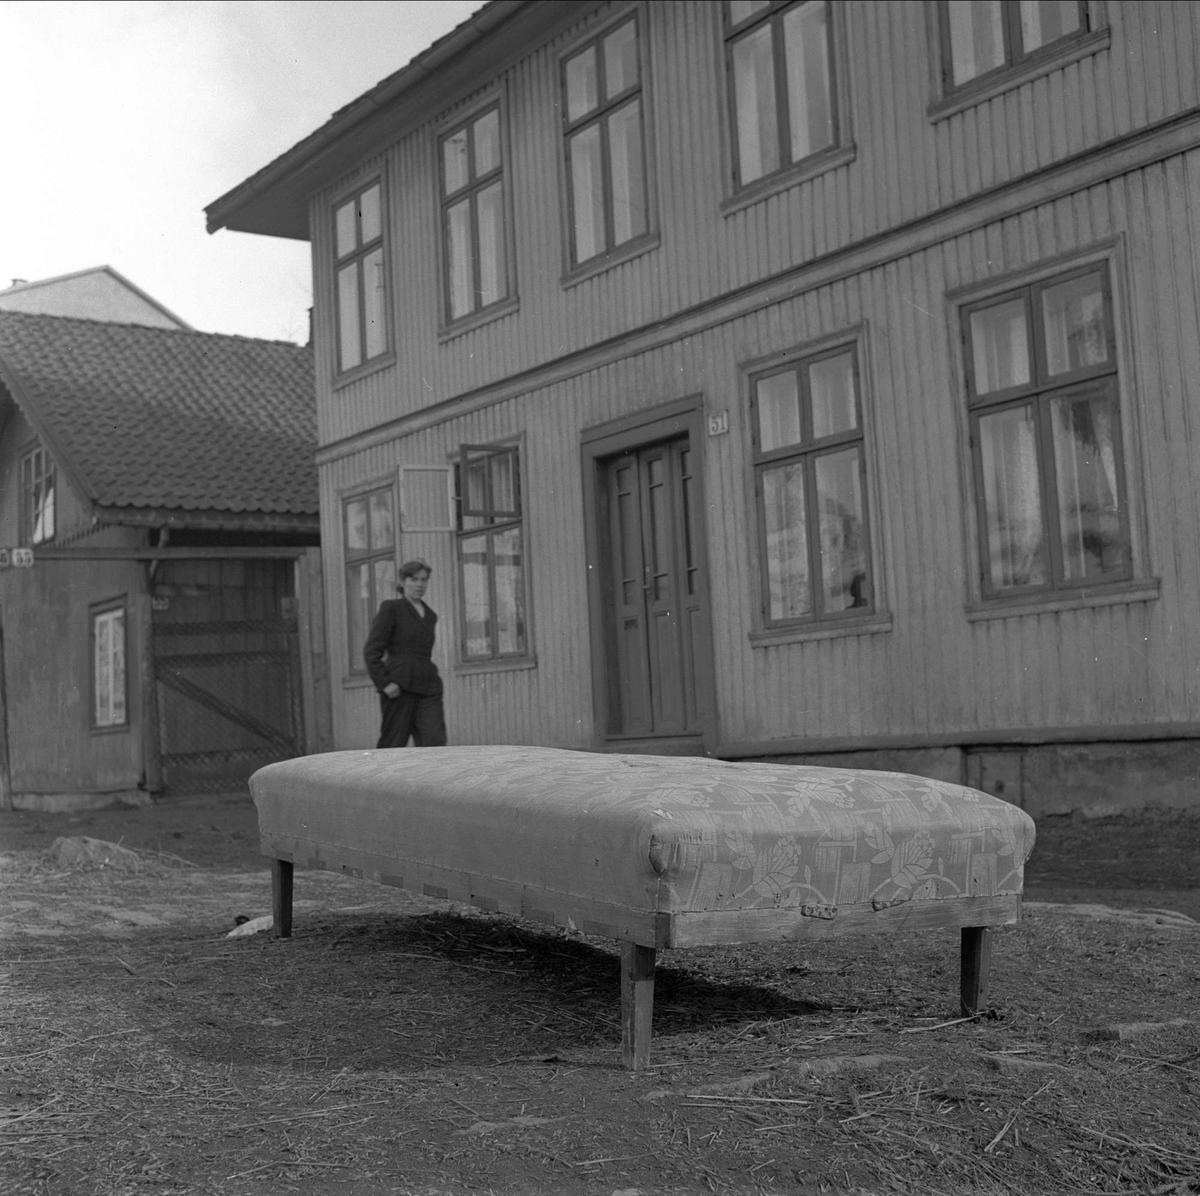 Trondheimsveien 51, Oslo. Divan på gata. Våren 1956.